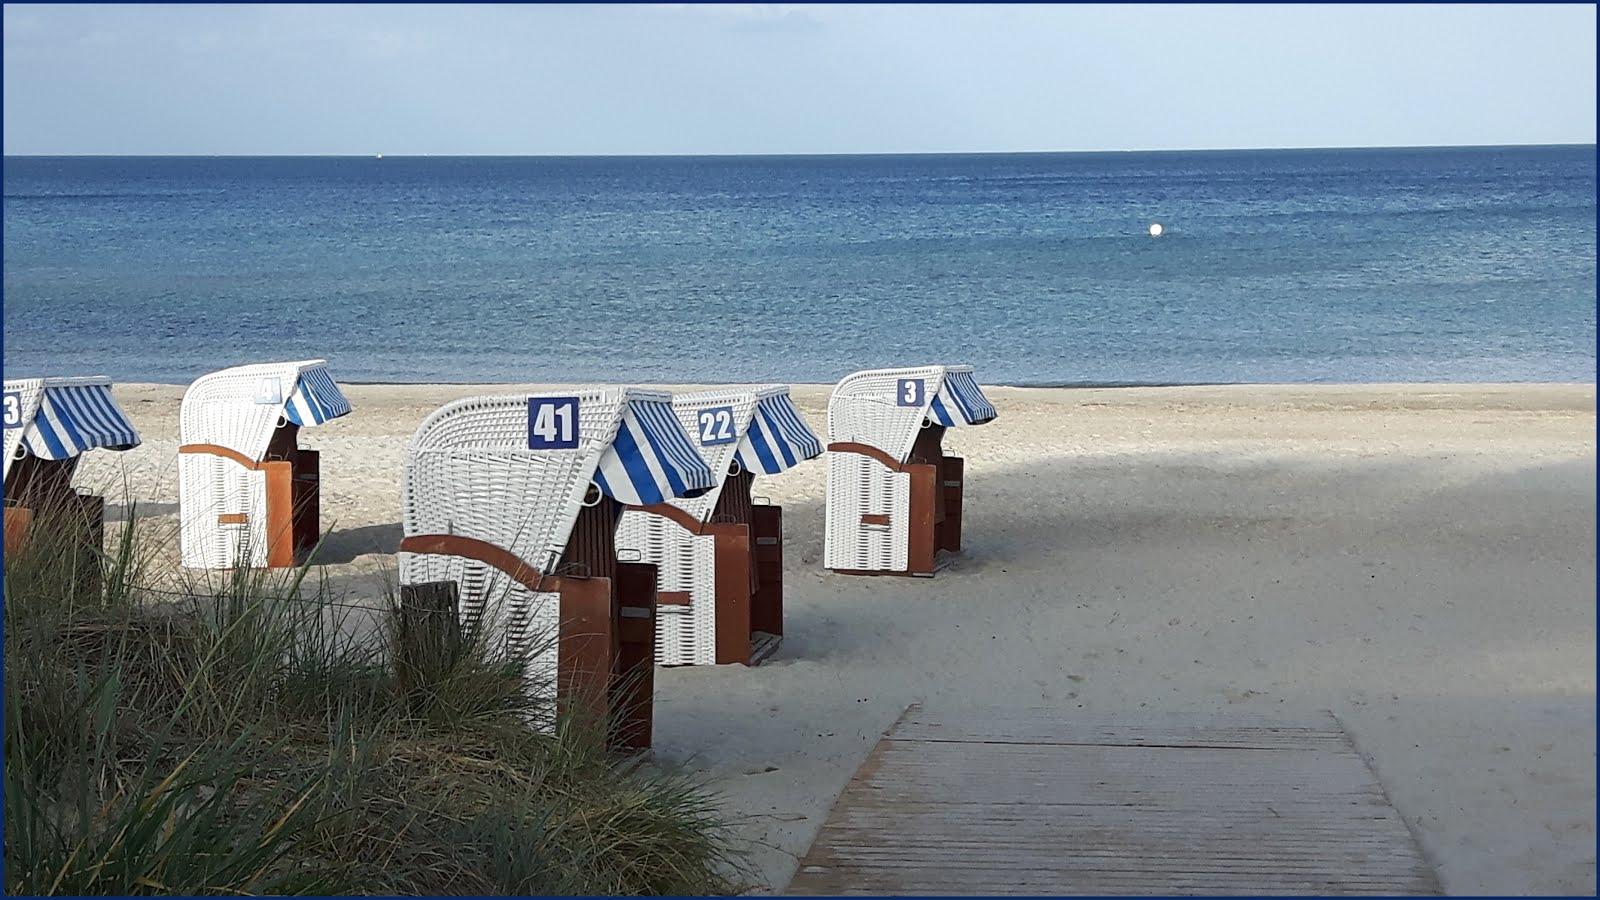 Epilog Monatsrückblick Juni 2020 oceanloveR Neuzugänge gelesen gehört Highlight Top Flop Statistik Warnemünde